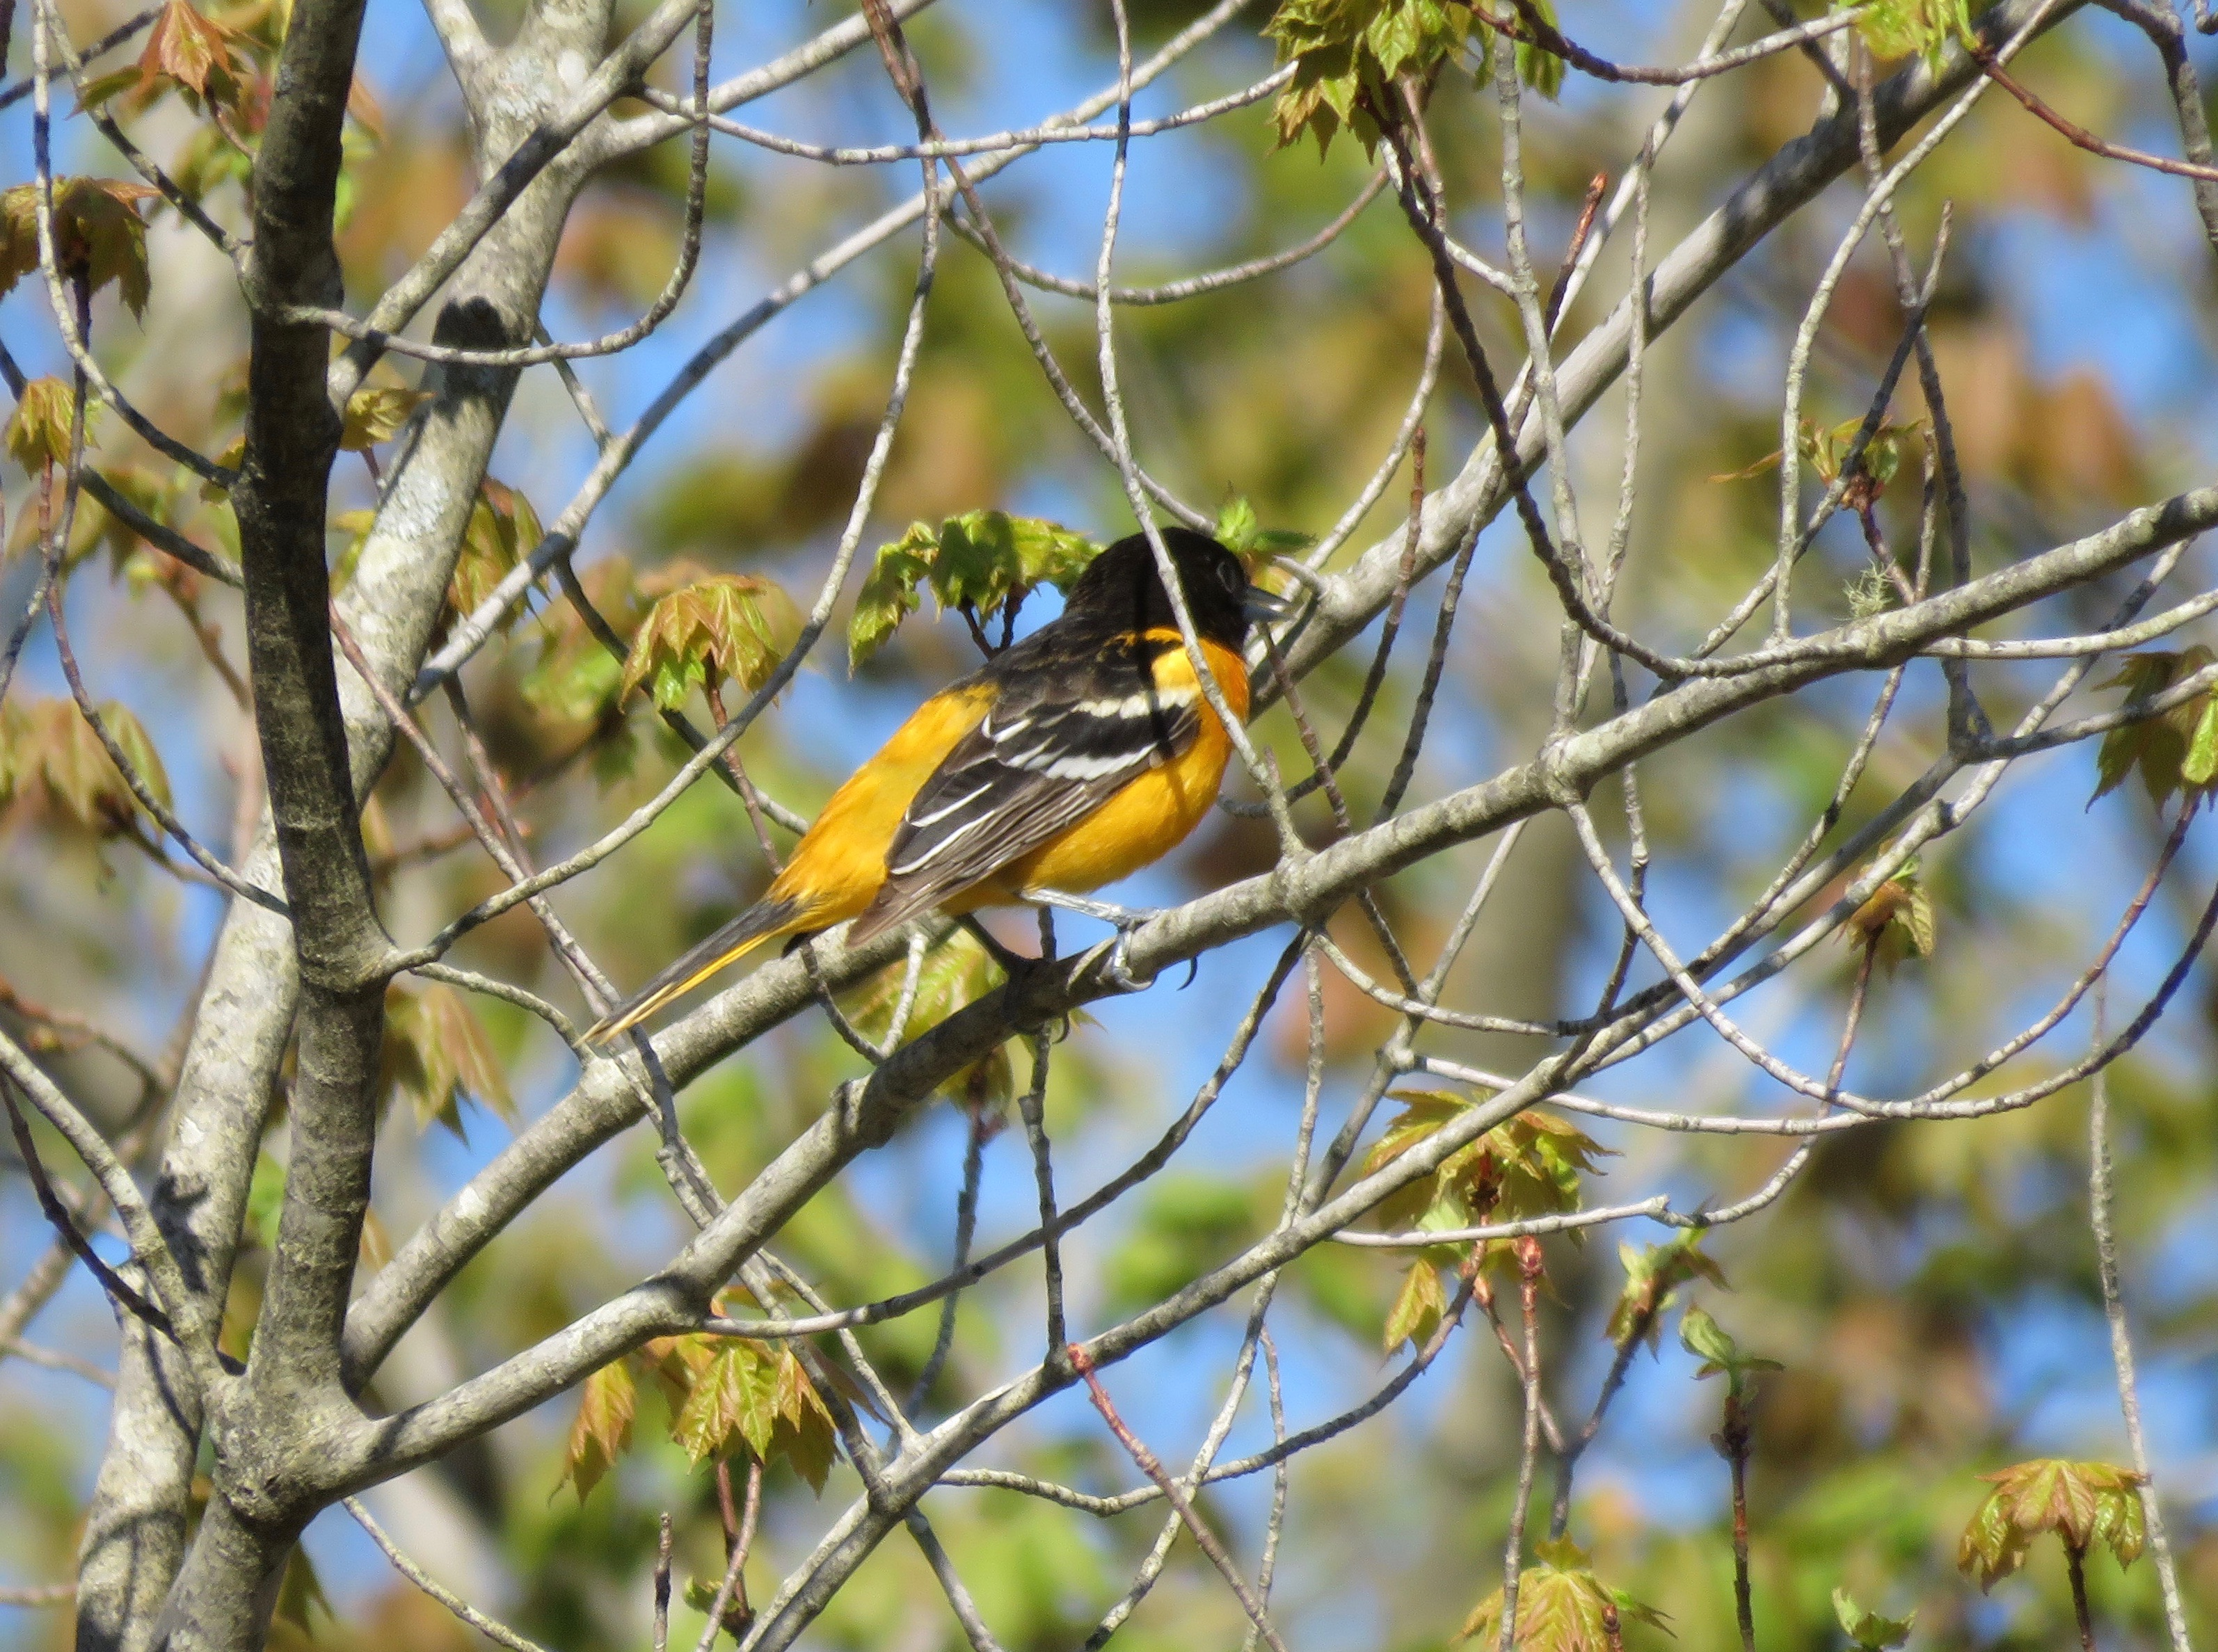 Tomando 'Birdland' a un nuevo nivel - Baltimore Sun